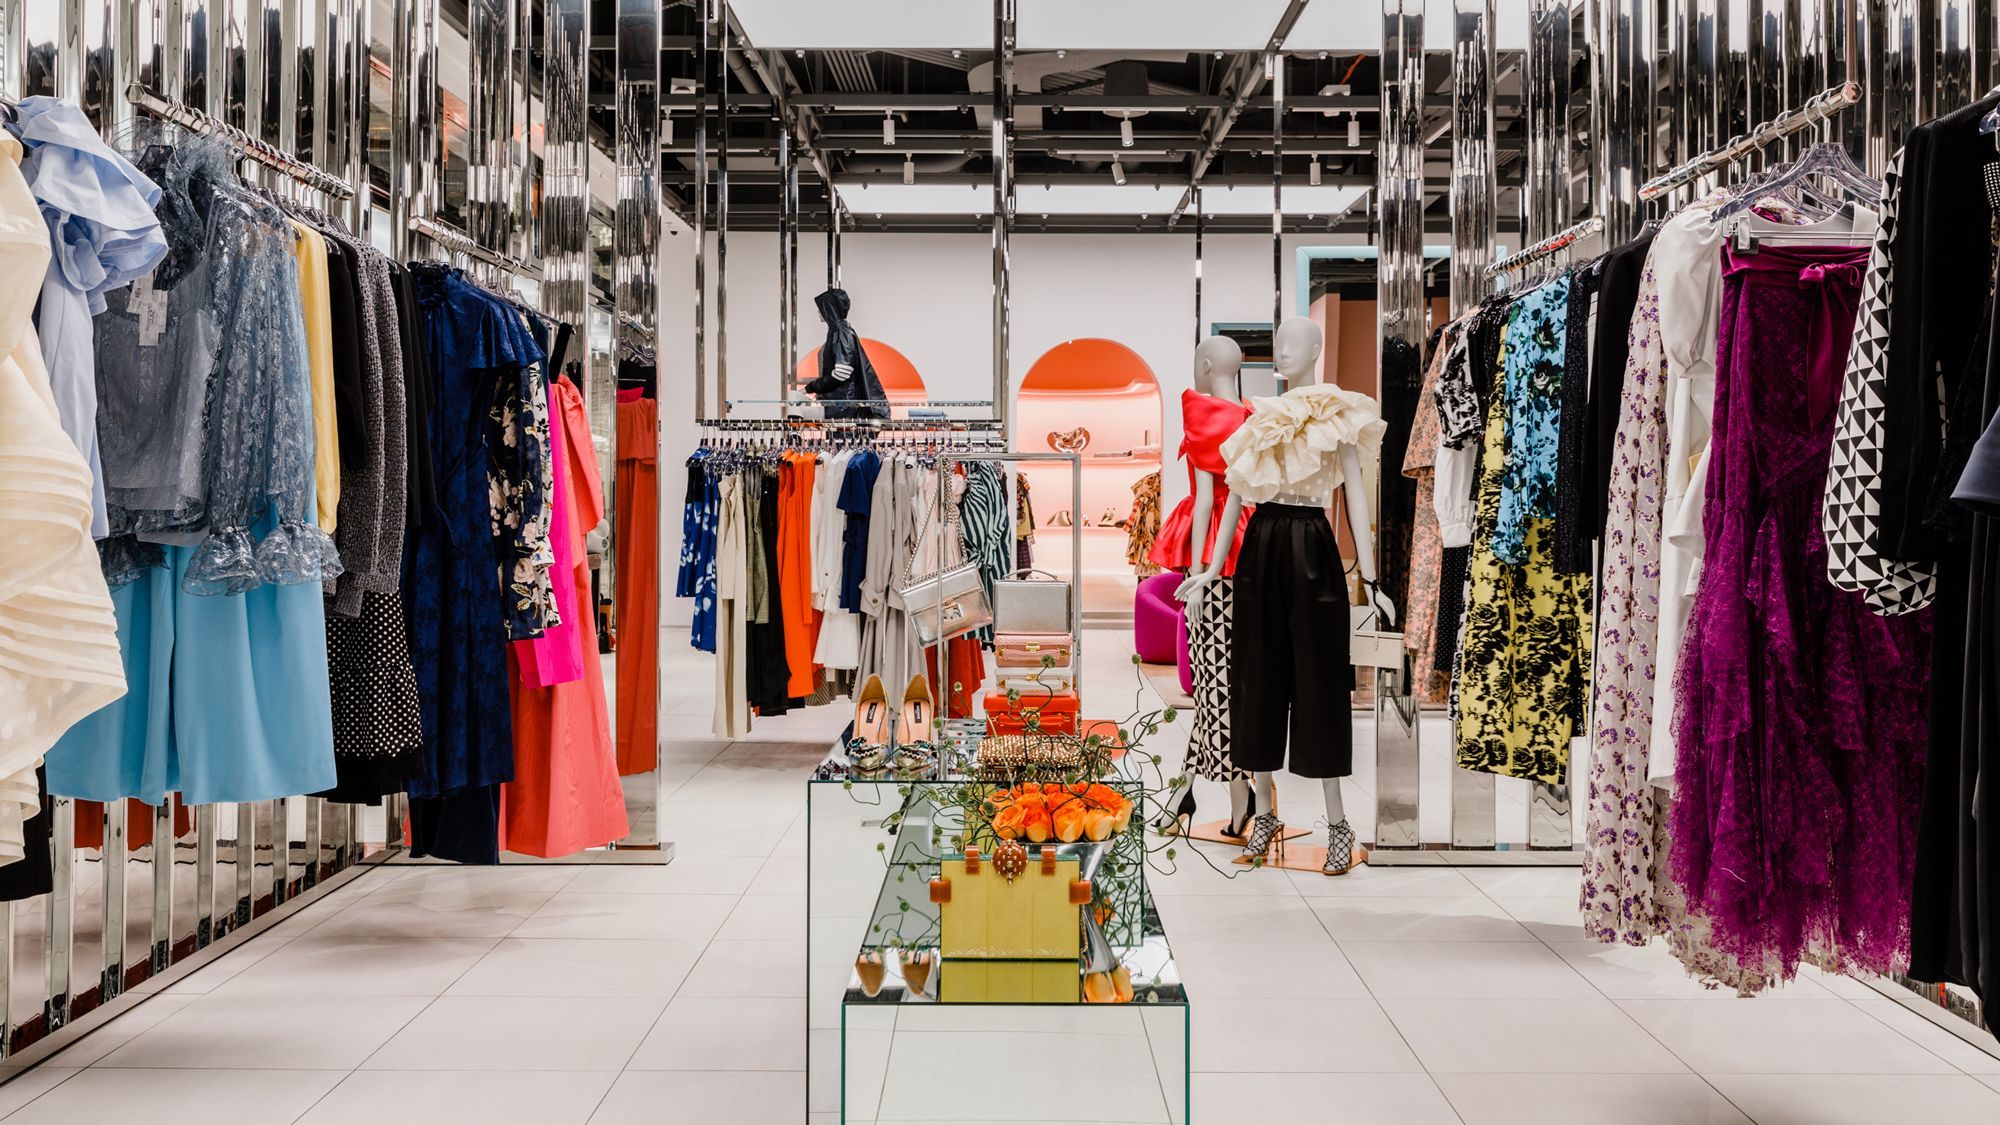 fortyfiveten buyers predict spring 2019 fashion trends